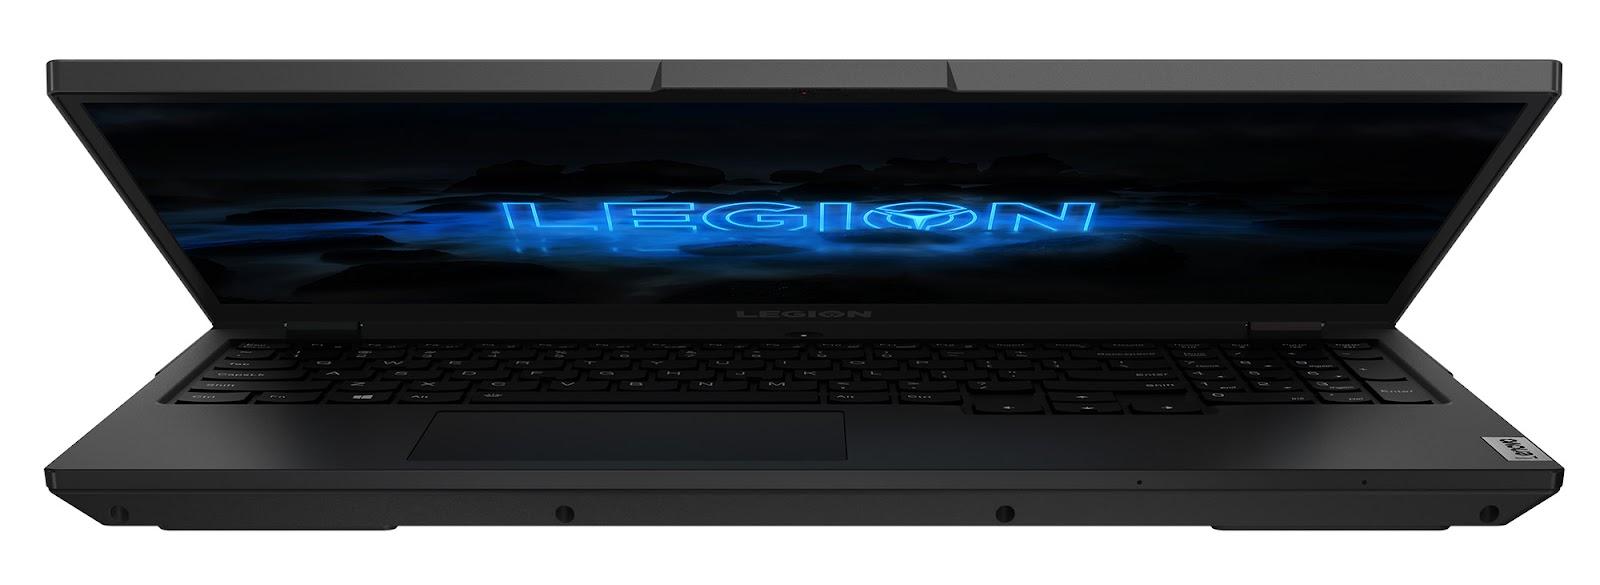 Фото 1. Ноутбук Lenovo Legion 5 15IMH05H Phantom Black (81Y600CXRE)